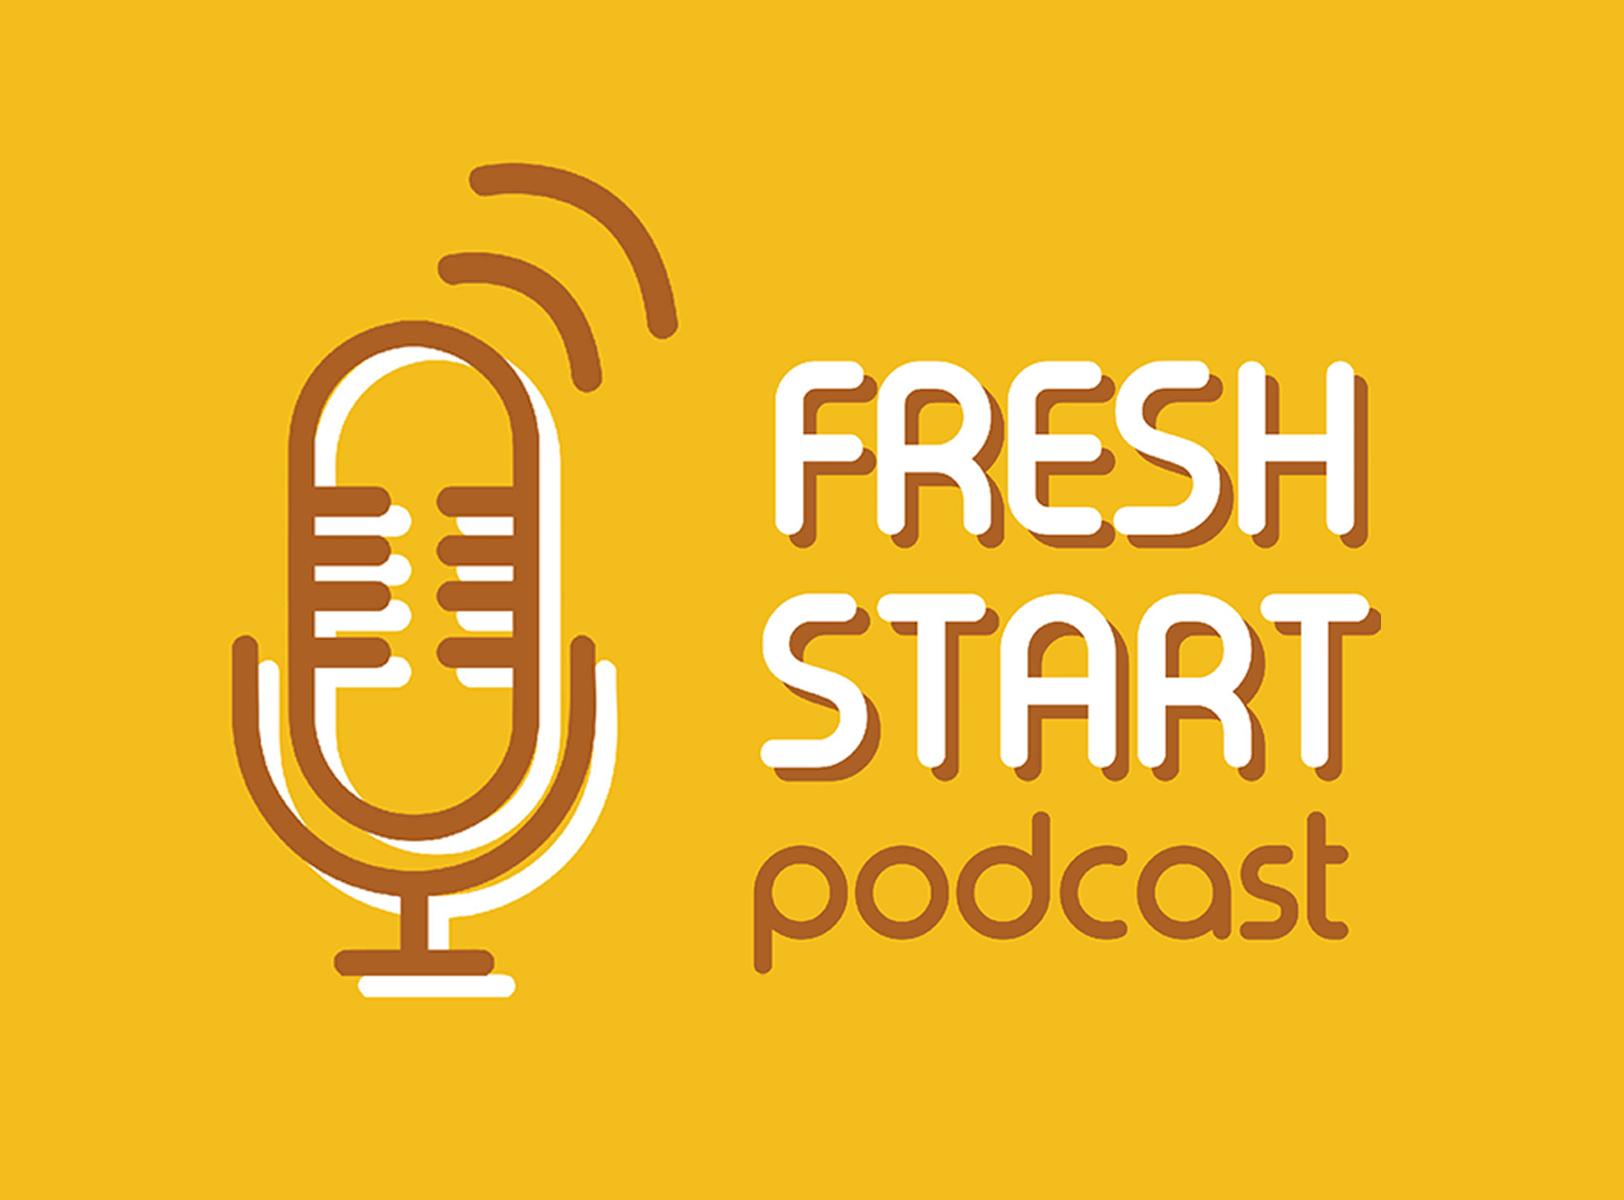 Fresh Start: Podcast News (7/10/2019 Wed.)